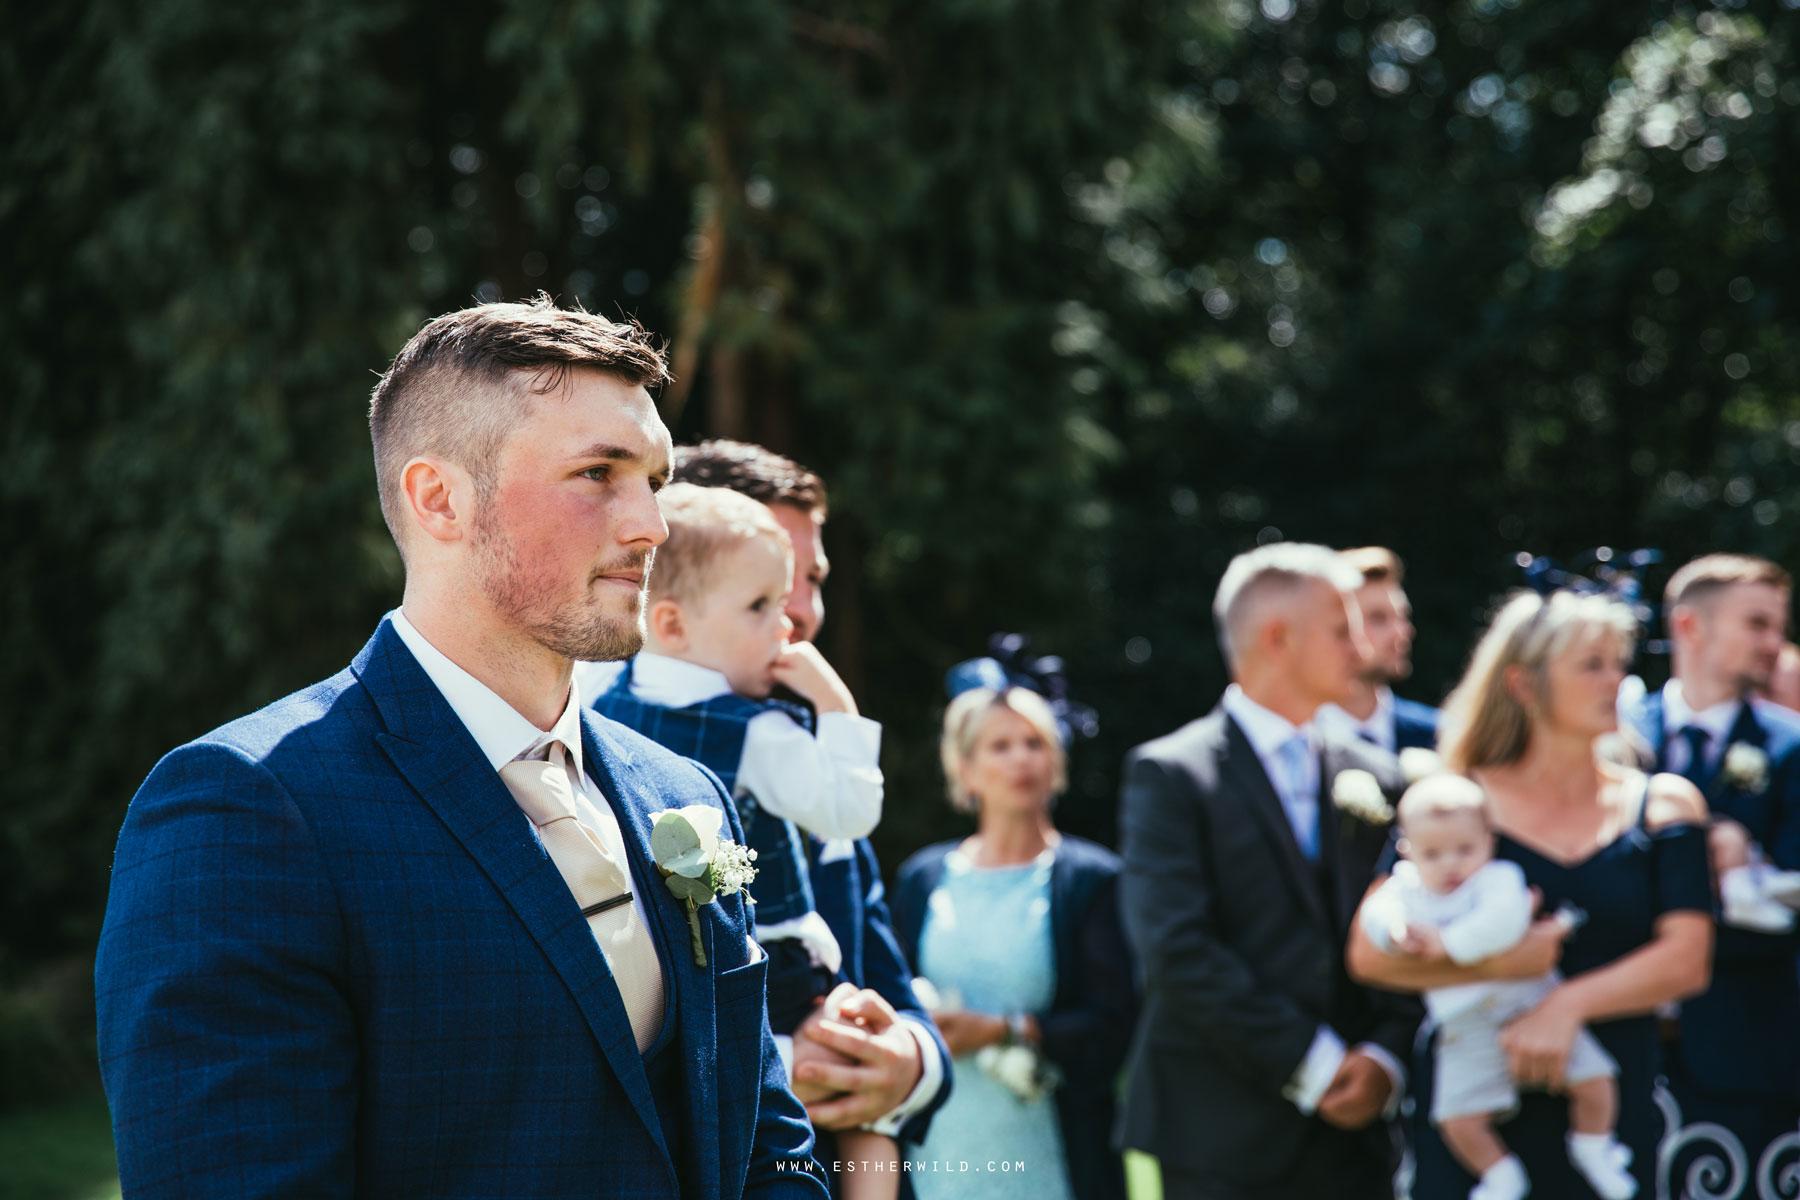 Lynford_Hall_Wedding_Thetford_Mundford_Esther_Wild_Photographer_IMG_1210.jpg